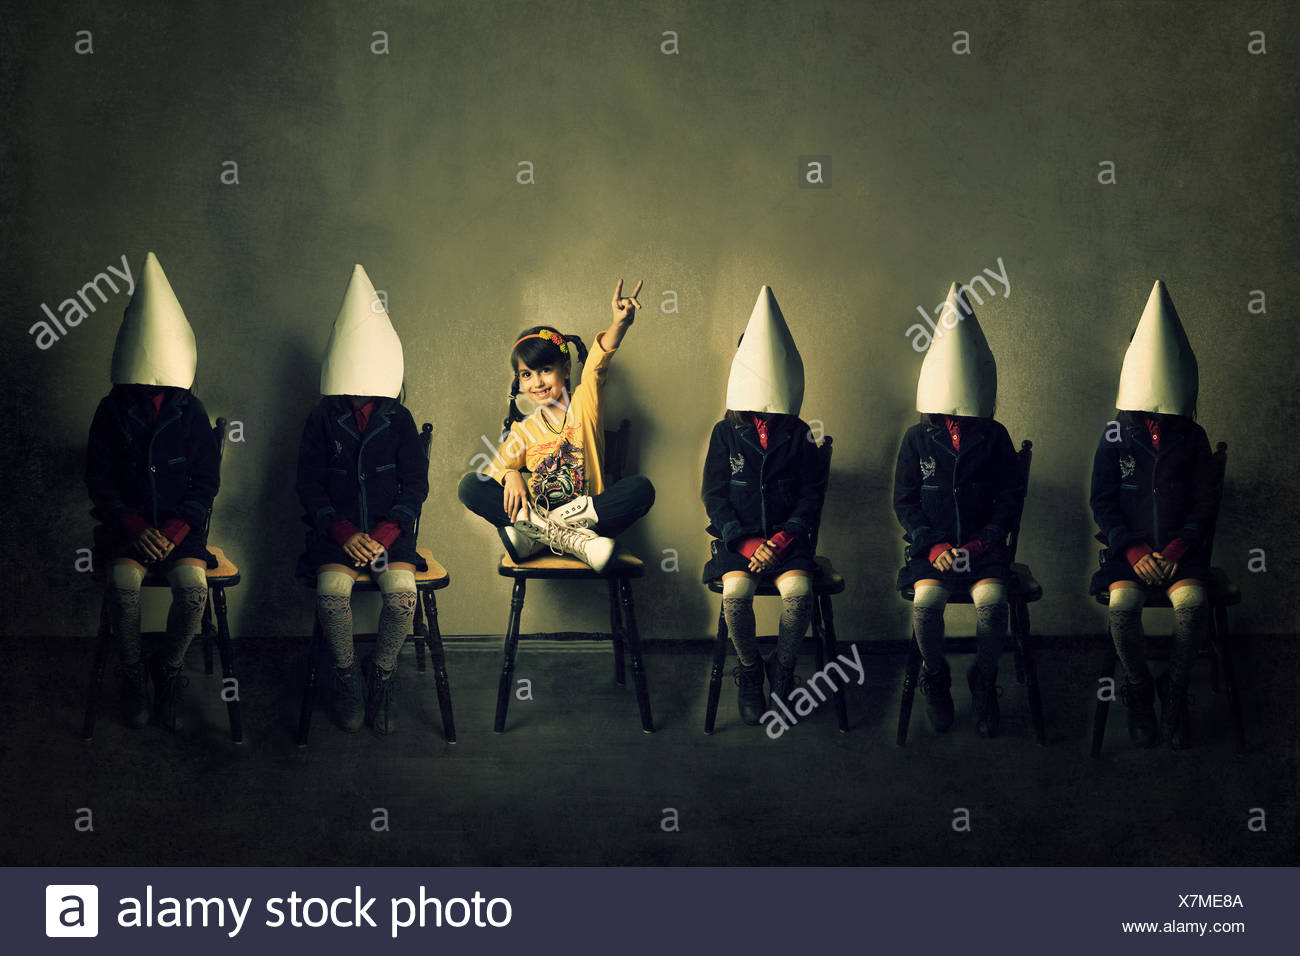 Seis niñas sentadas en sillas en una fila Imagen De Stock